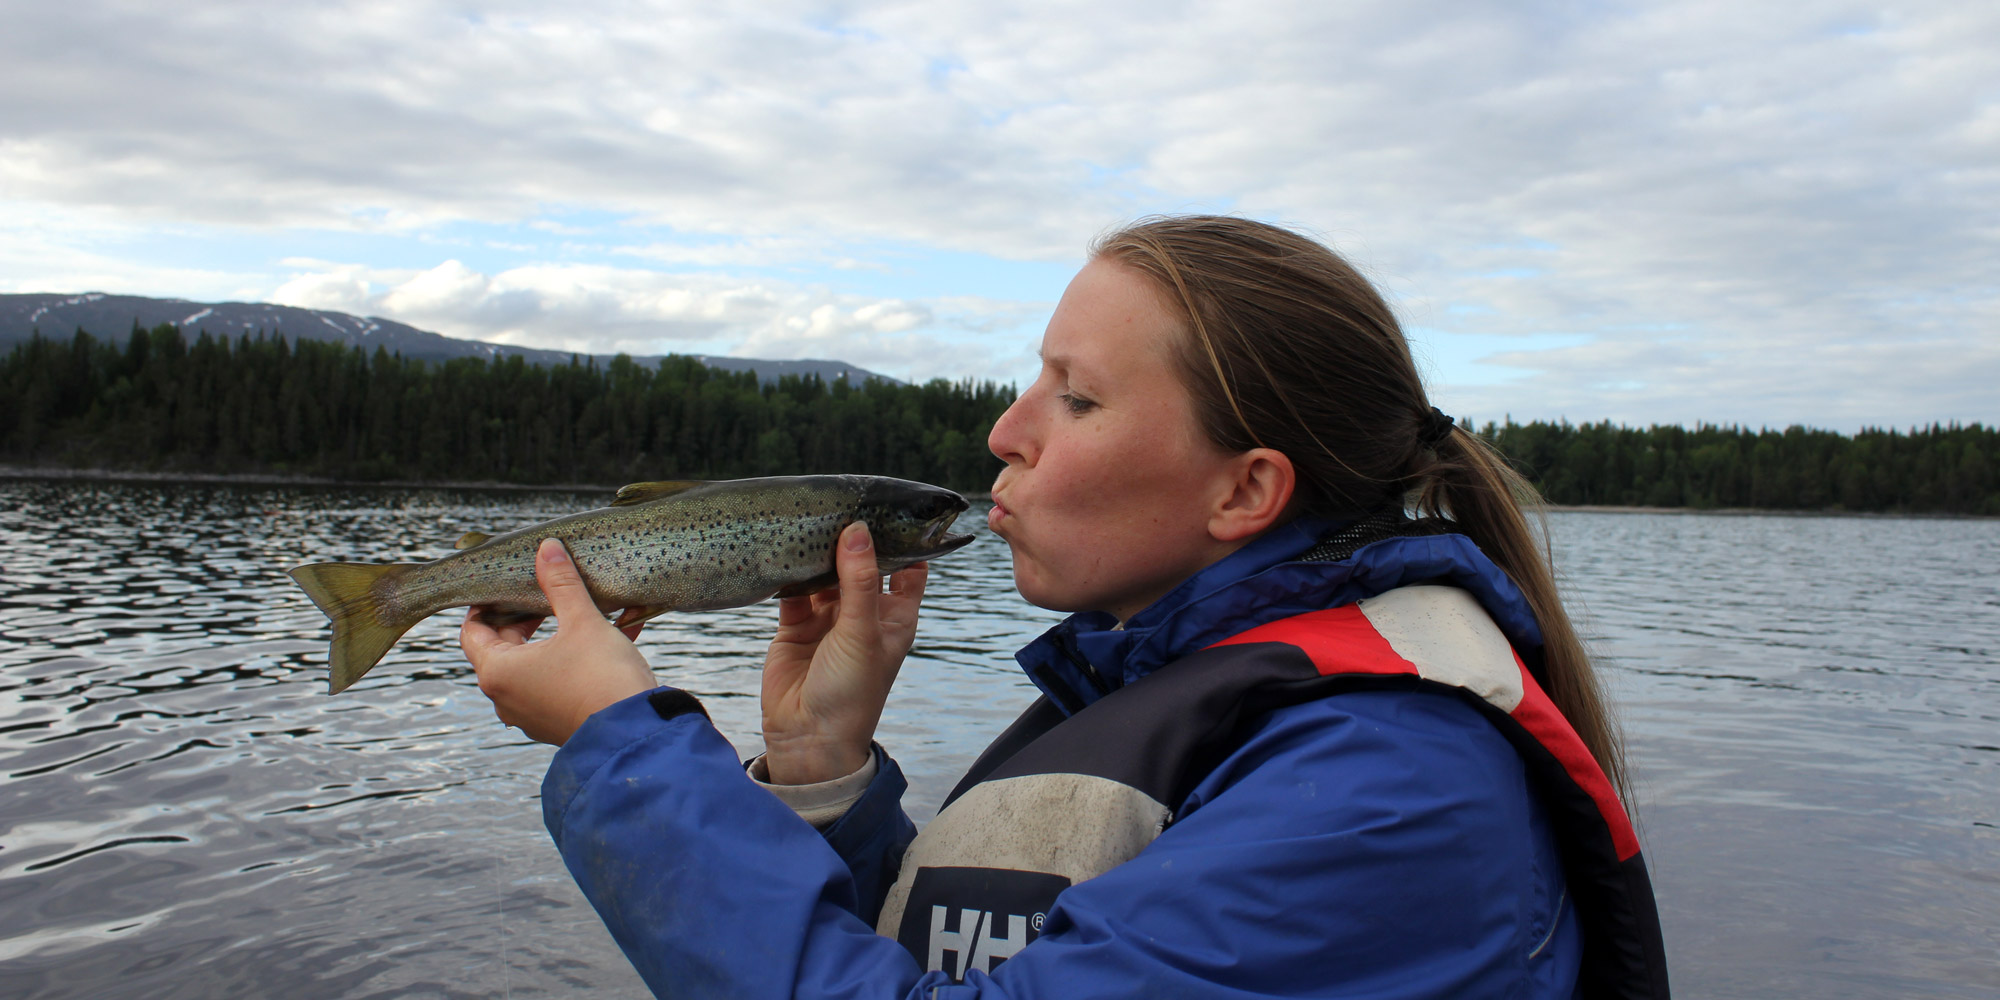 Christine har fiskelykke i Snåsavatnet ved Oldernæs Strandcamp. Copyright: Visit Innherred